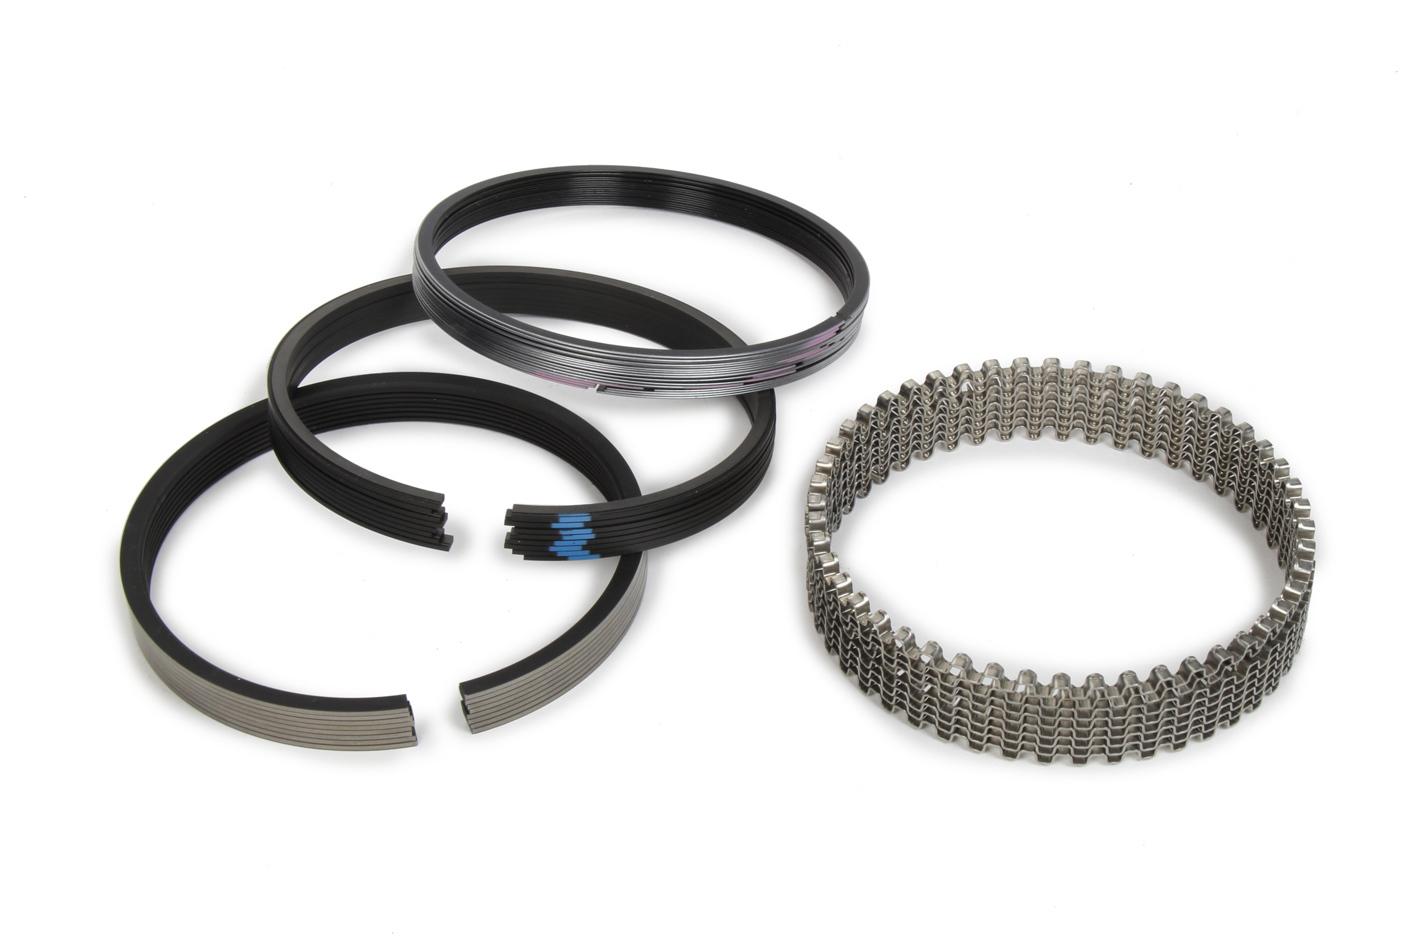 Piston Ring Set 4.350 Moly 1/16 1/16 3/16